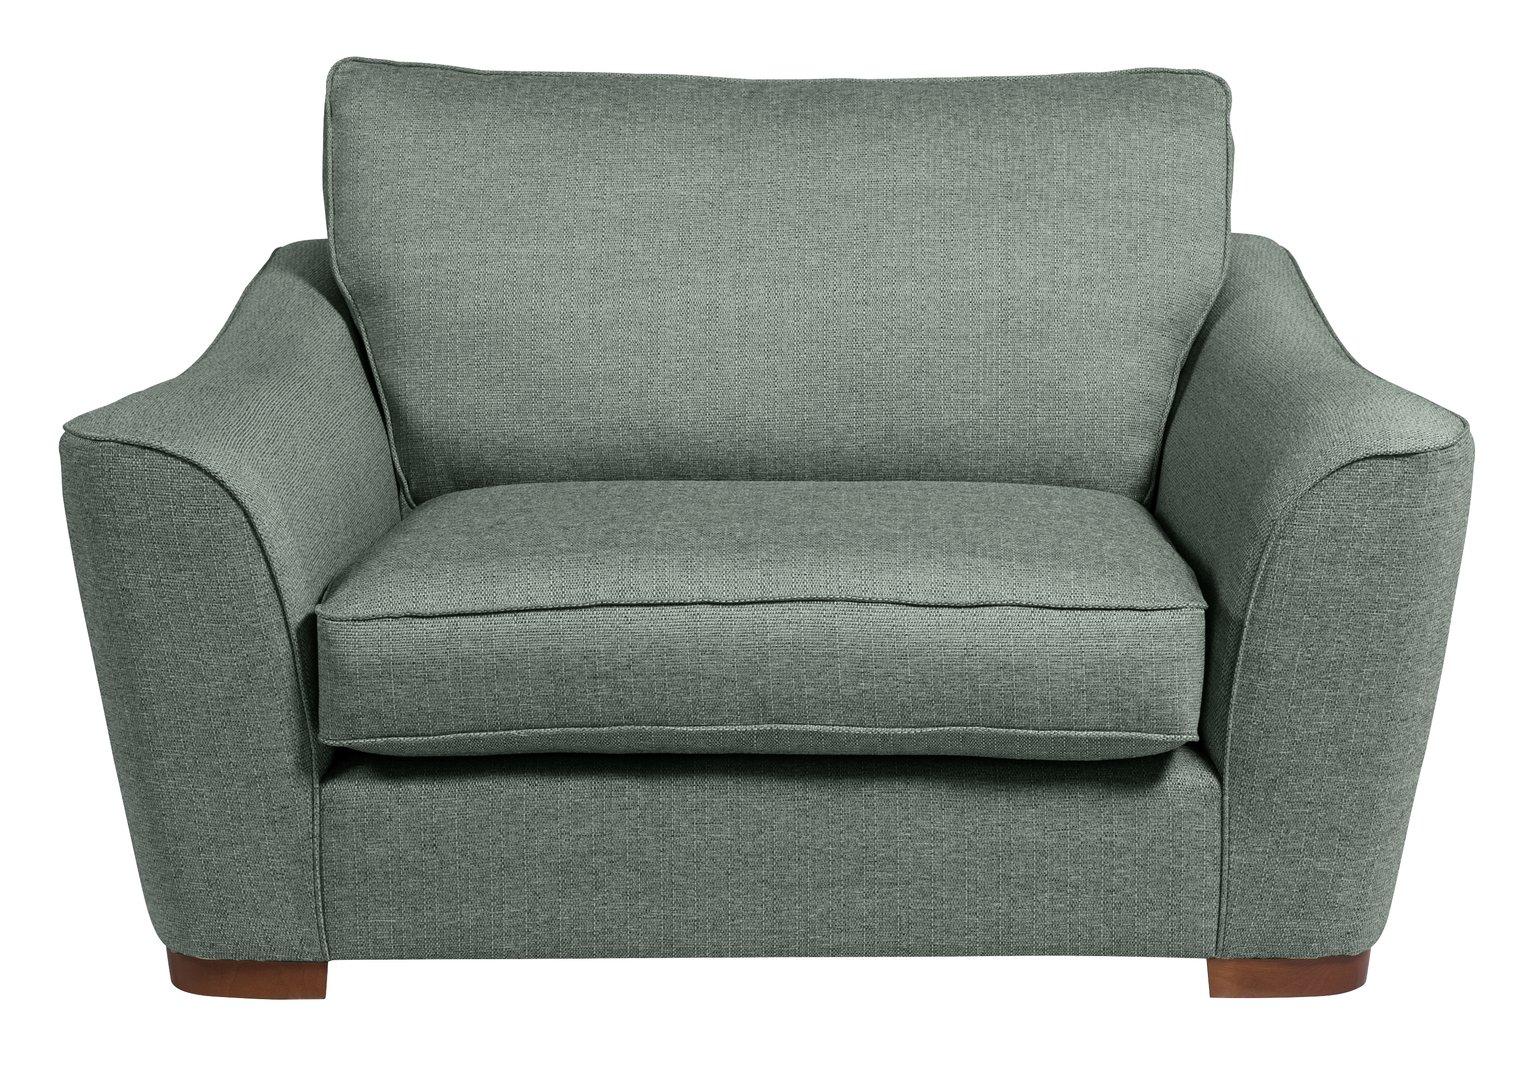 Argos Home Lotus Fabric Cuddle Chair - Seaglass